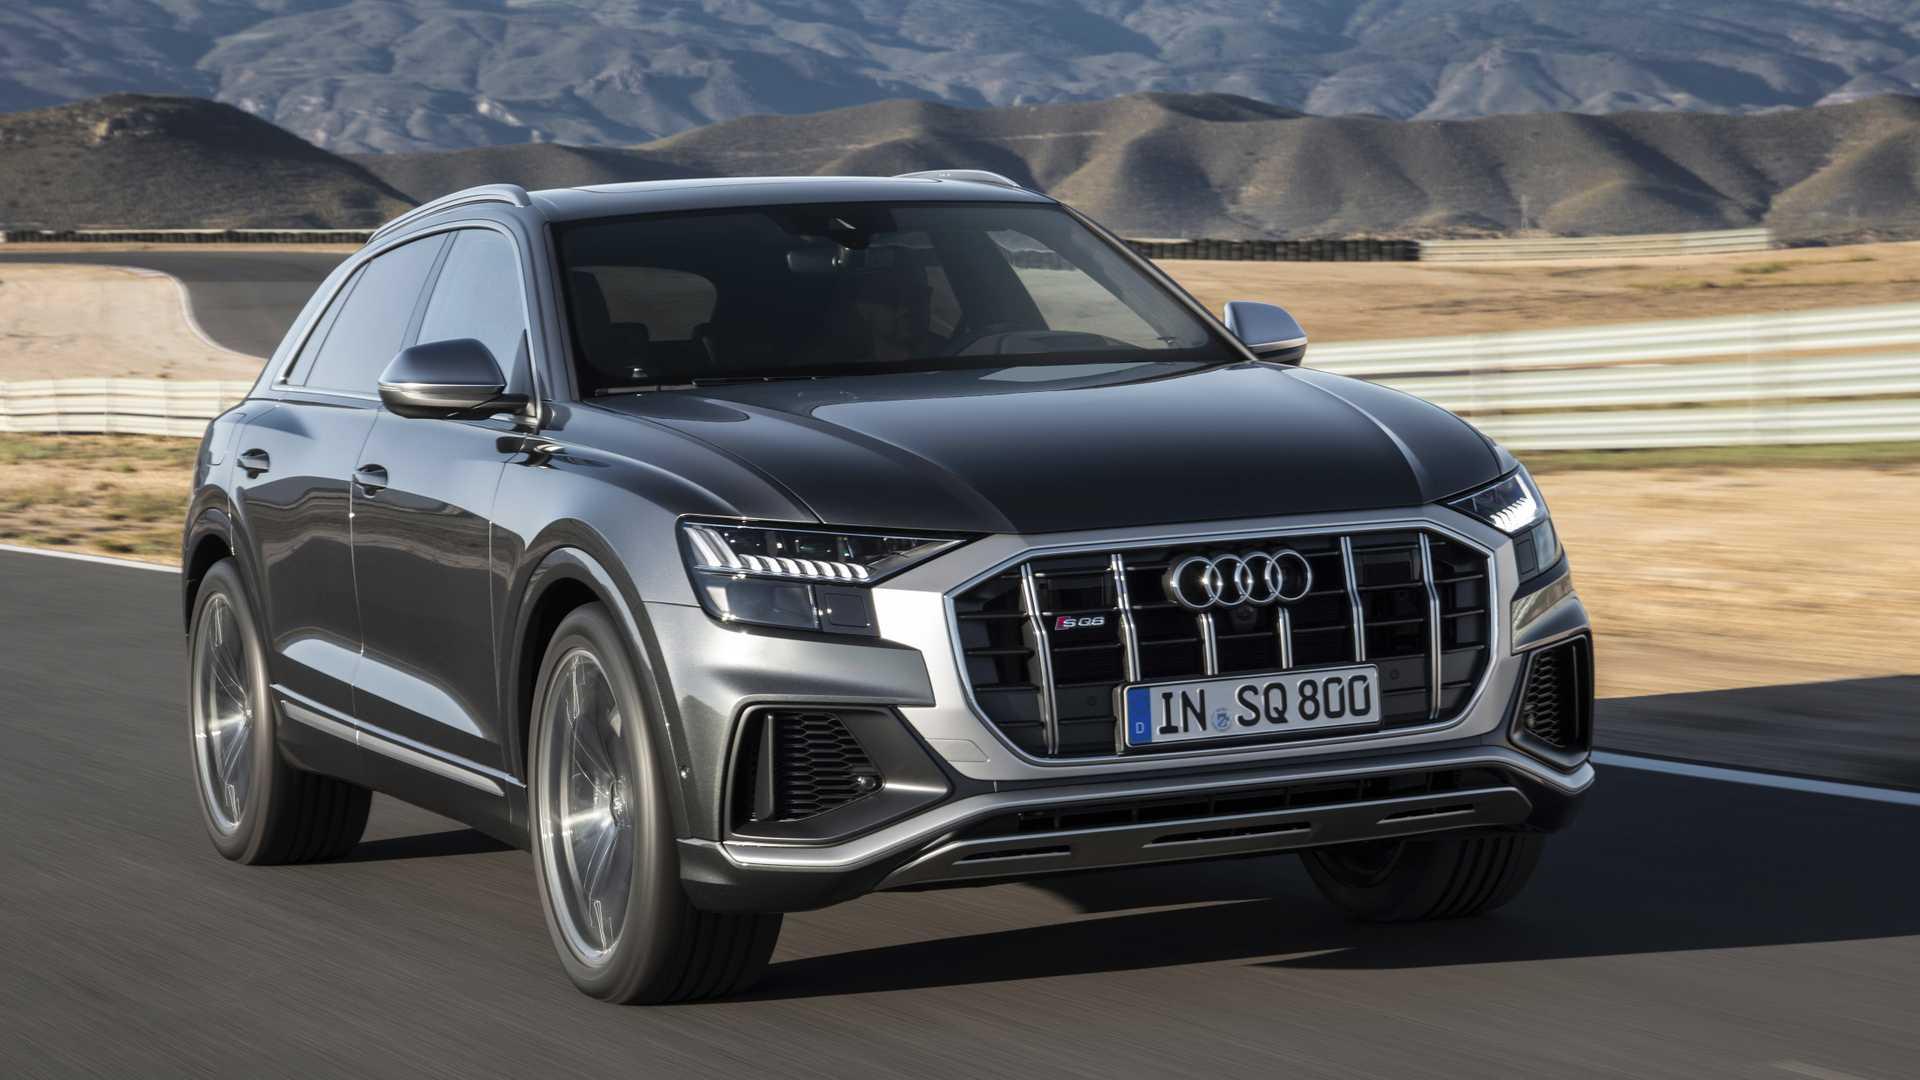 2019 Audi Sq8 Revealed With Diesel V 8